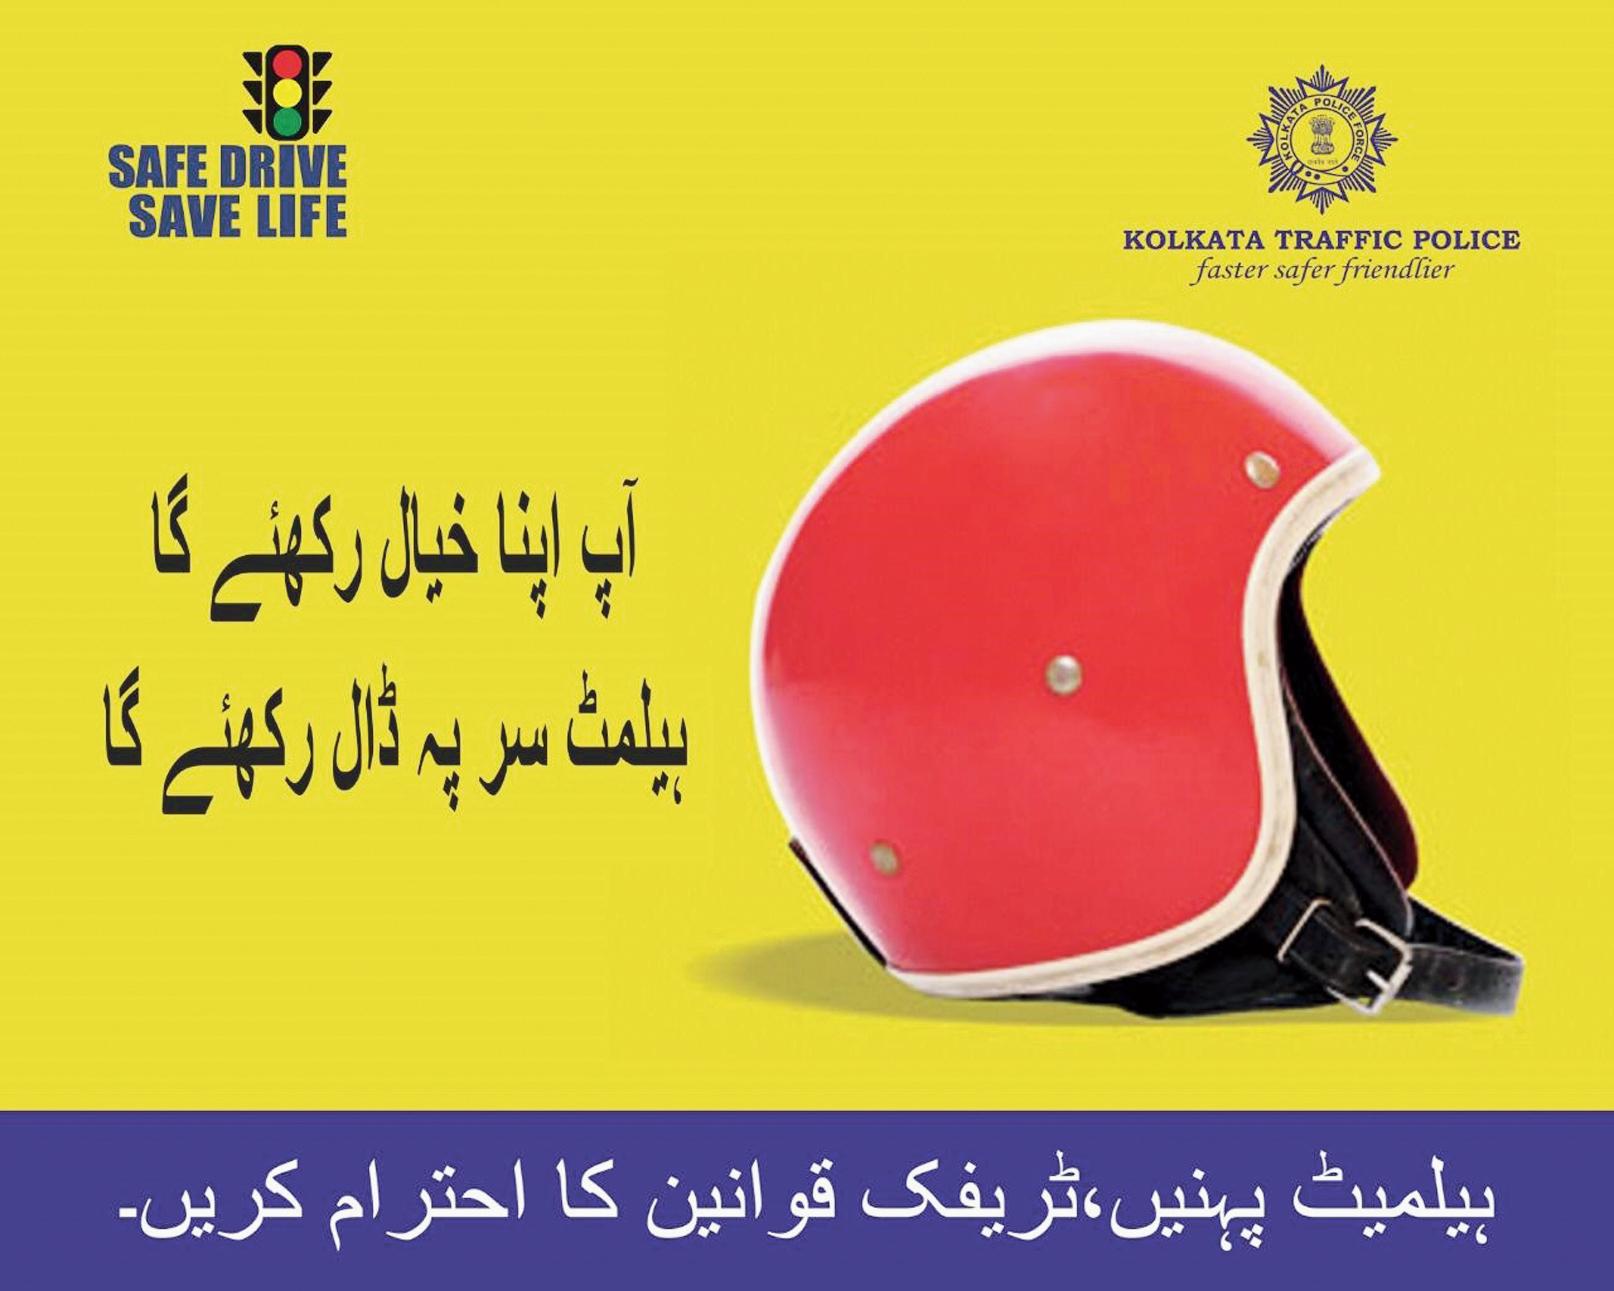 A Urdu leaflet that reads Aap apna khayaal rakhiyega, Sar pe helmet daal rakhiyega (Take care of yourself, keep the helmet on your head)